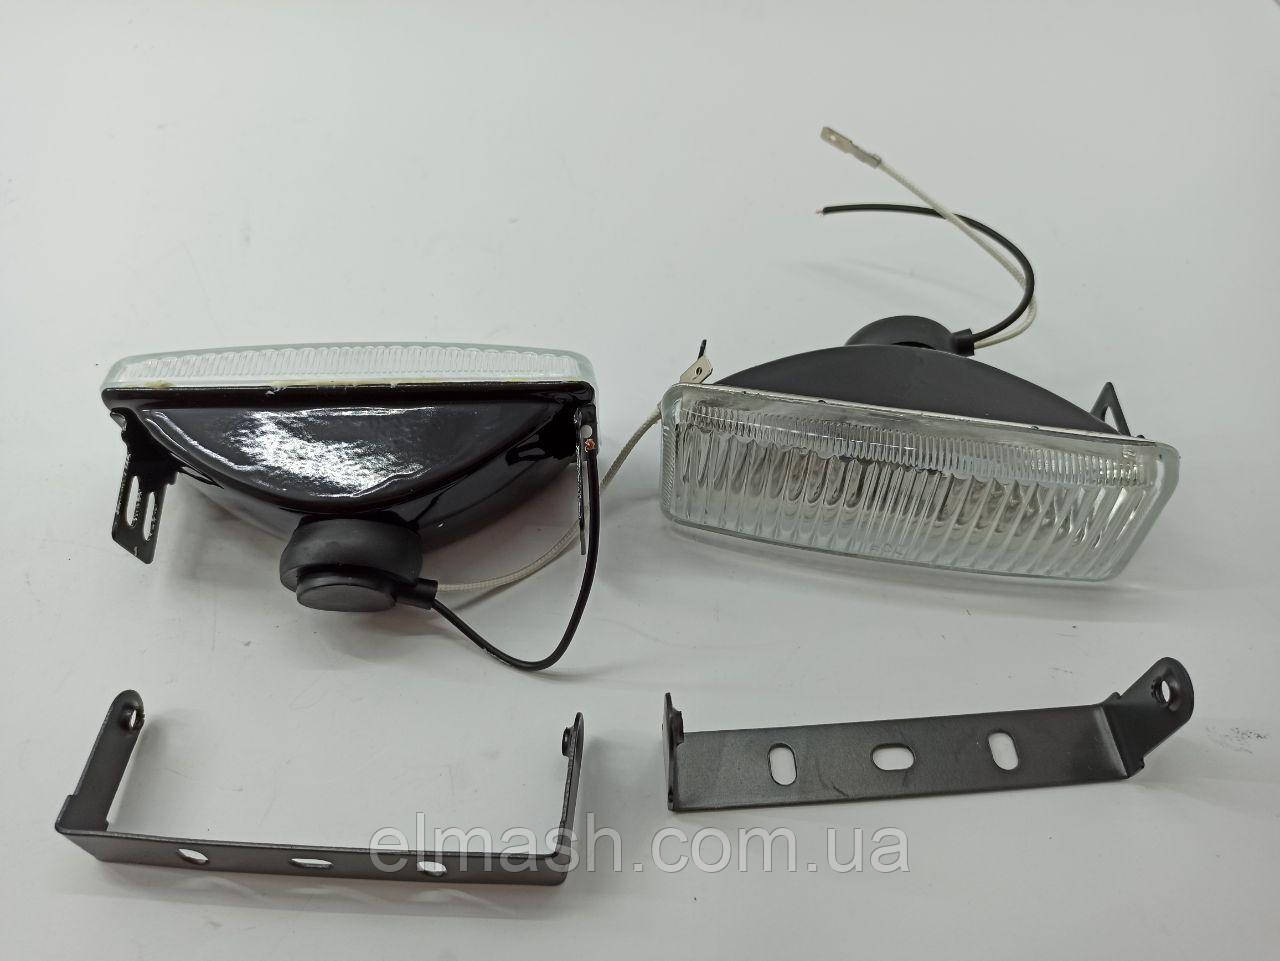 Фары дополнительные белые, H3/12V/55W,128*45mm